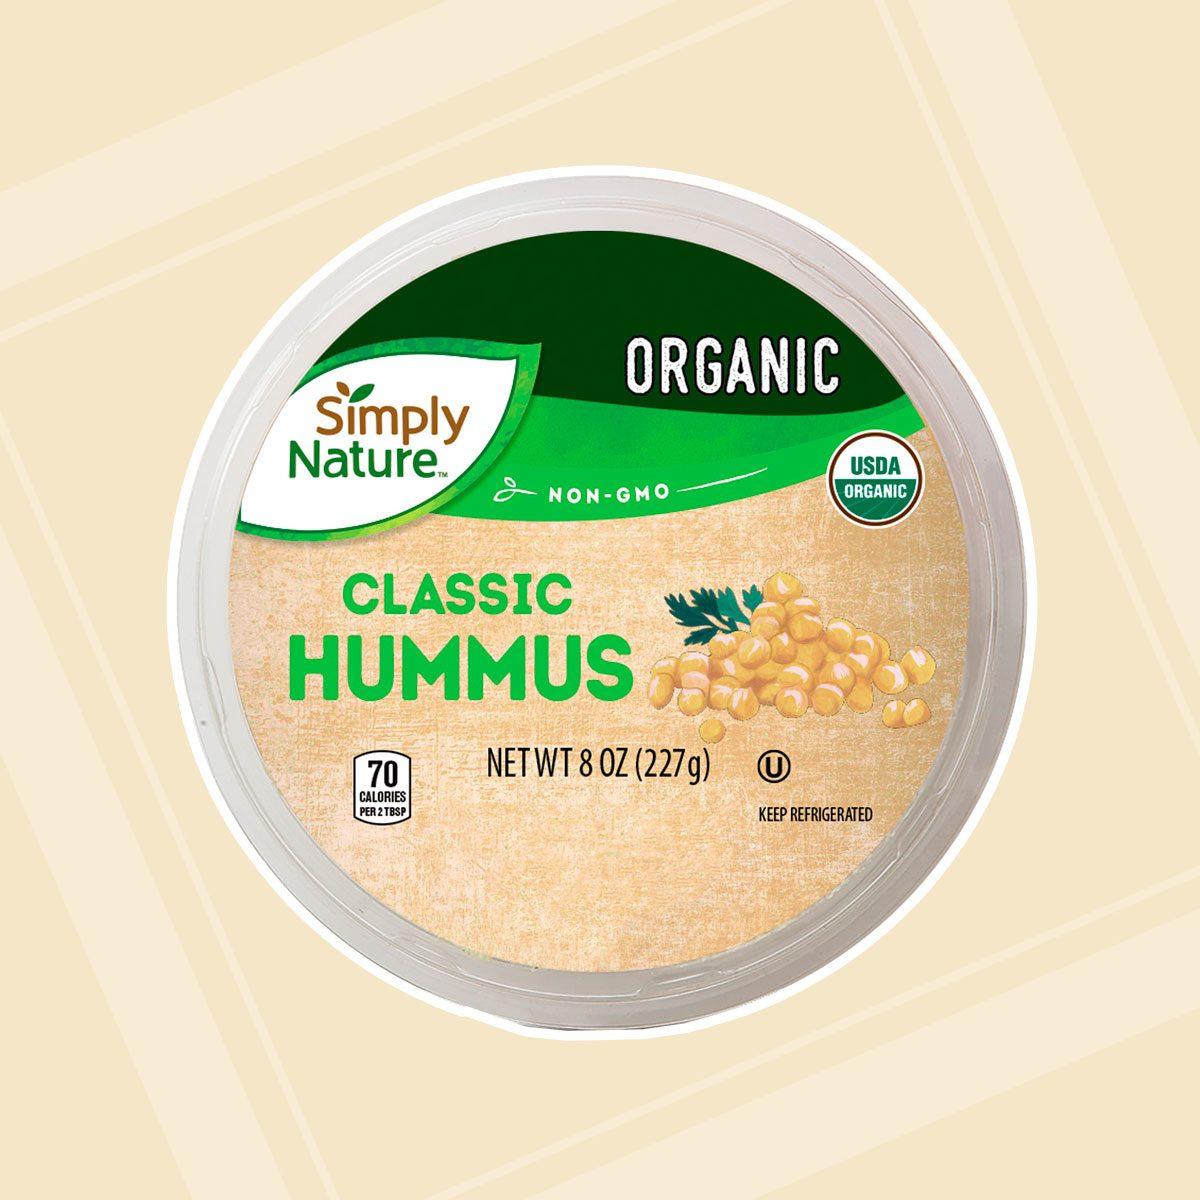 Simply Nature Hummus